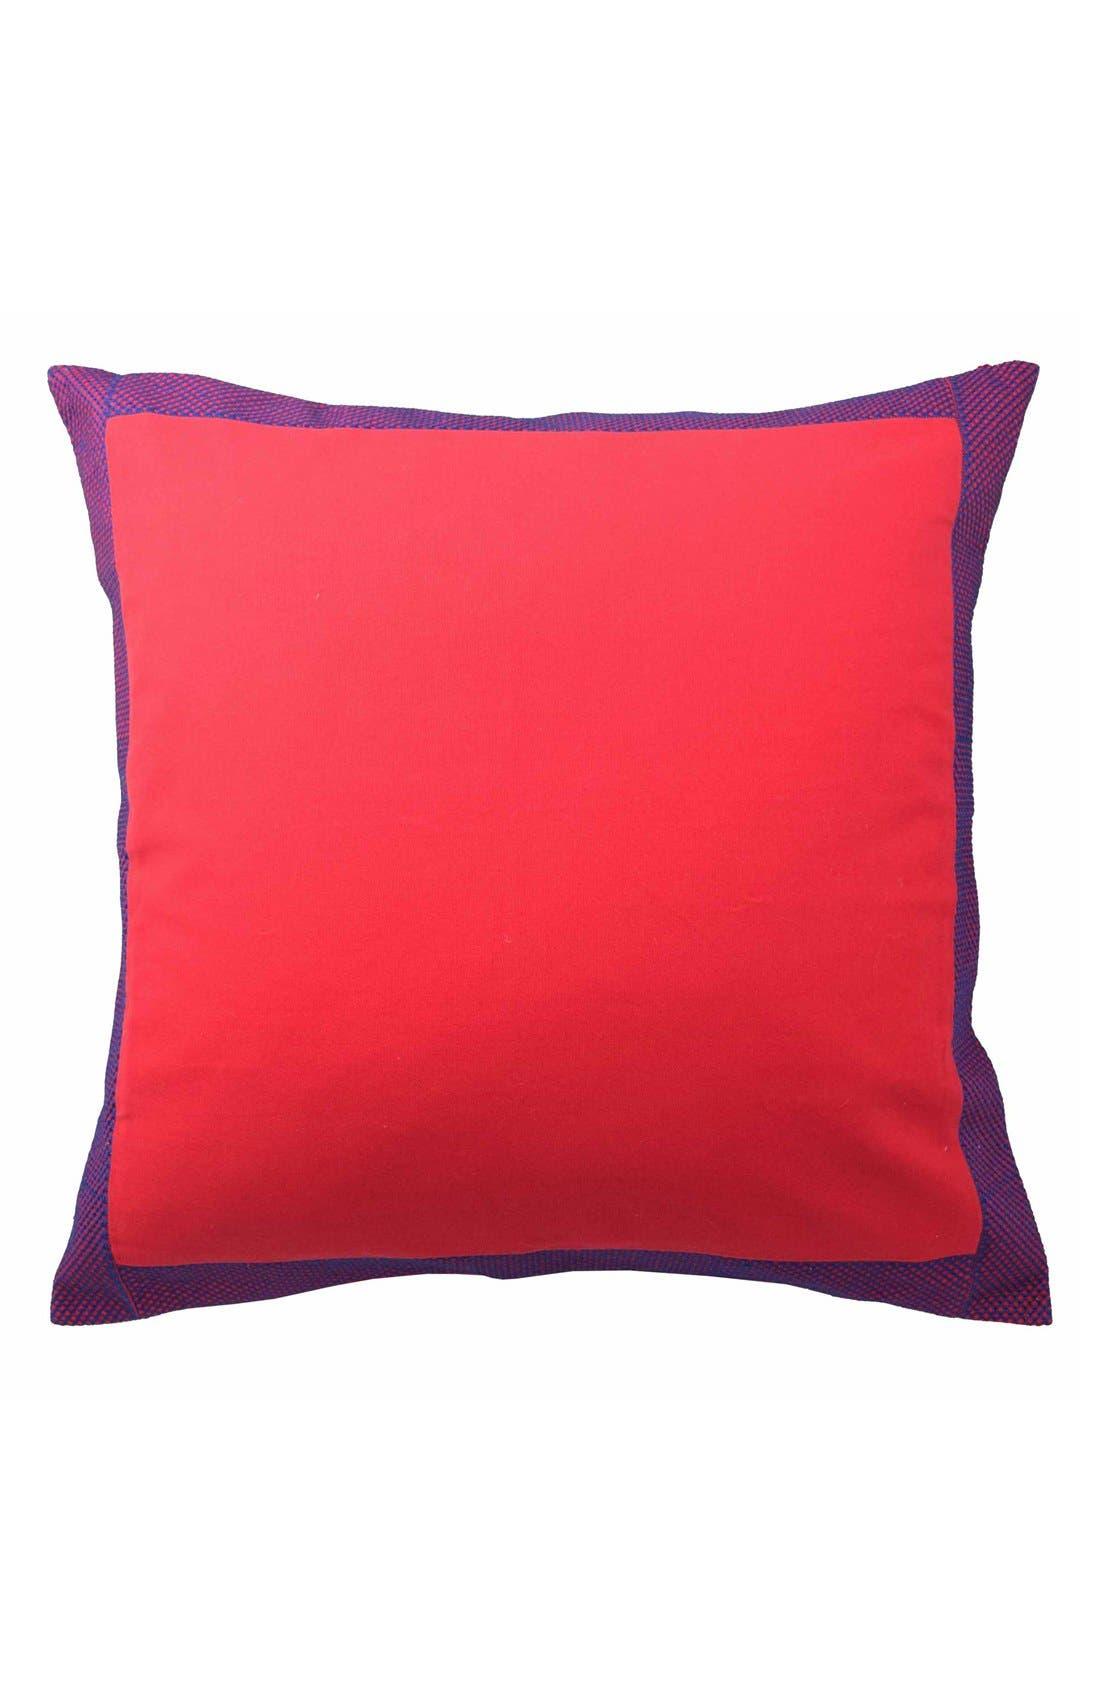 'Tanzania Kira' Euro Sham,                         Main,                         color, Red